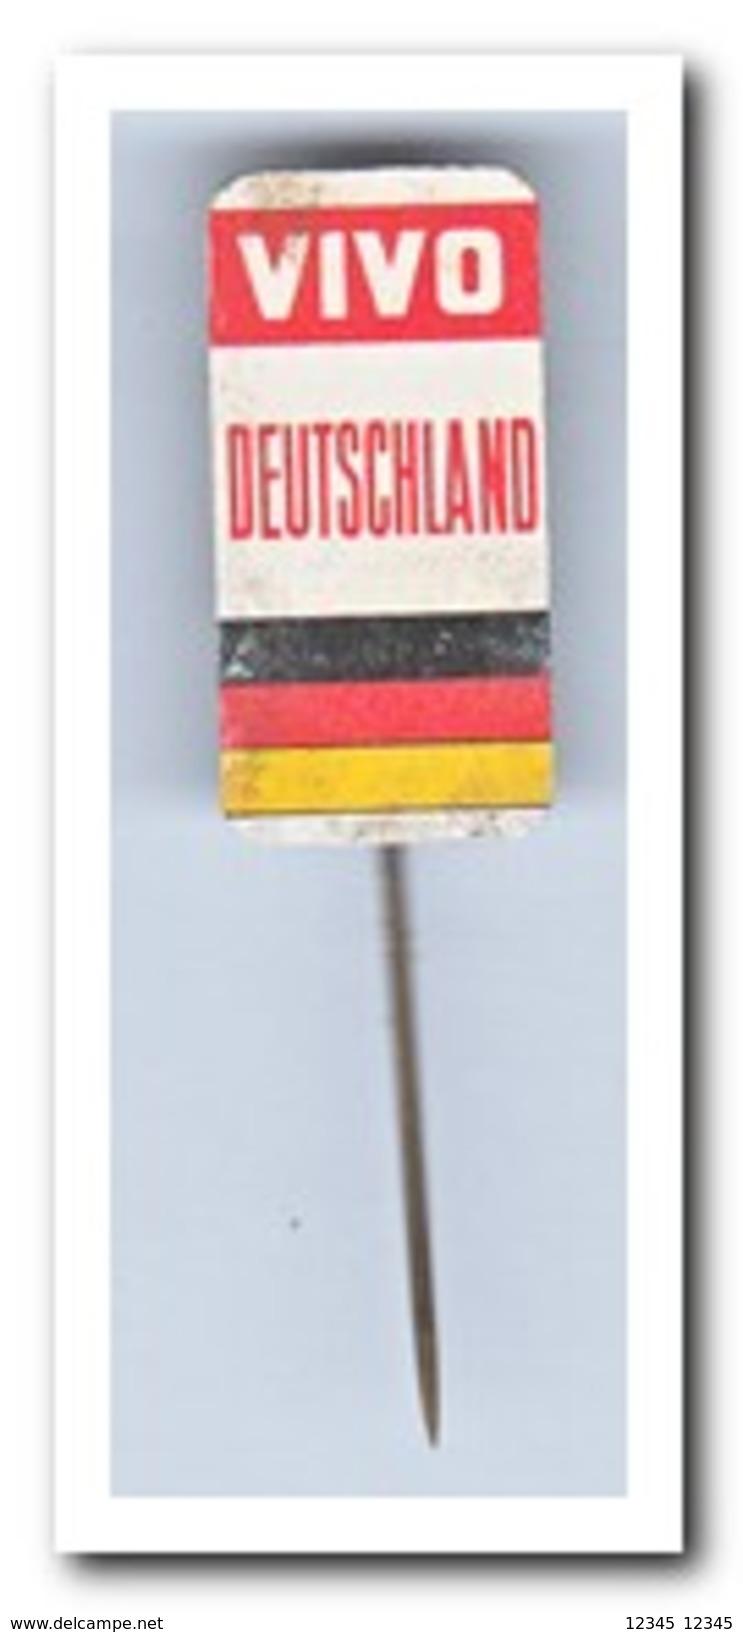 VIVO Deutschland - Pin's & Anstecknadeln